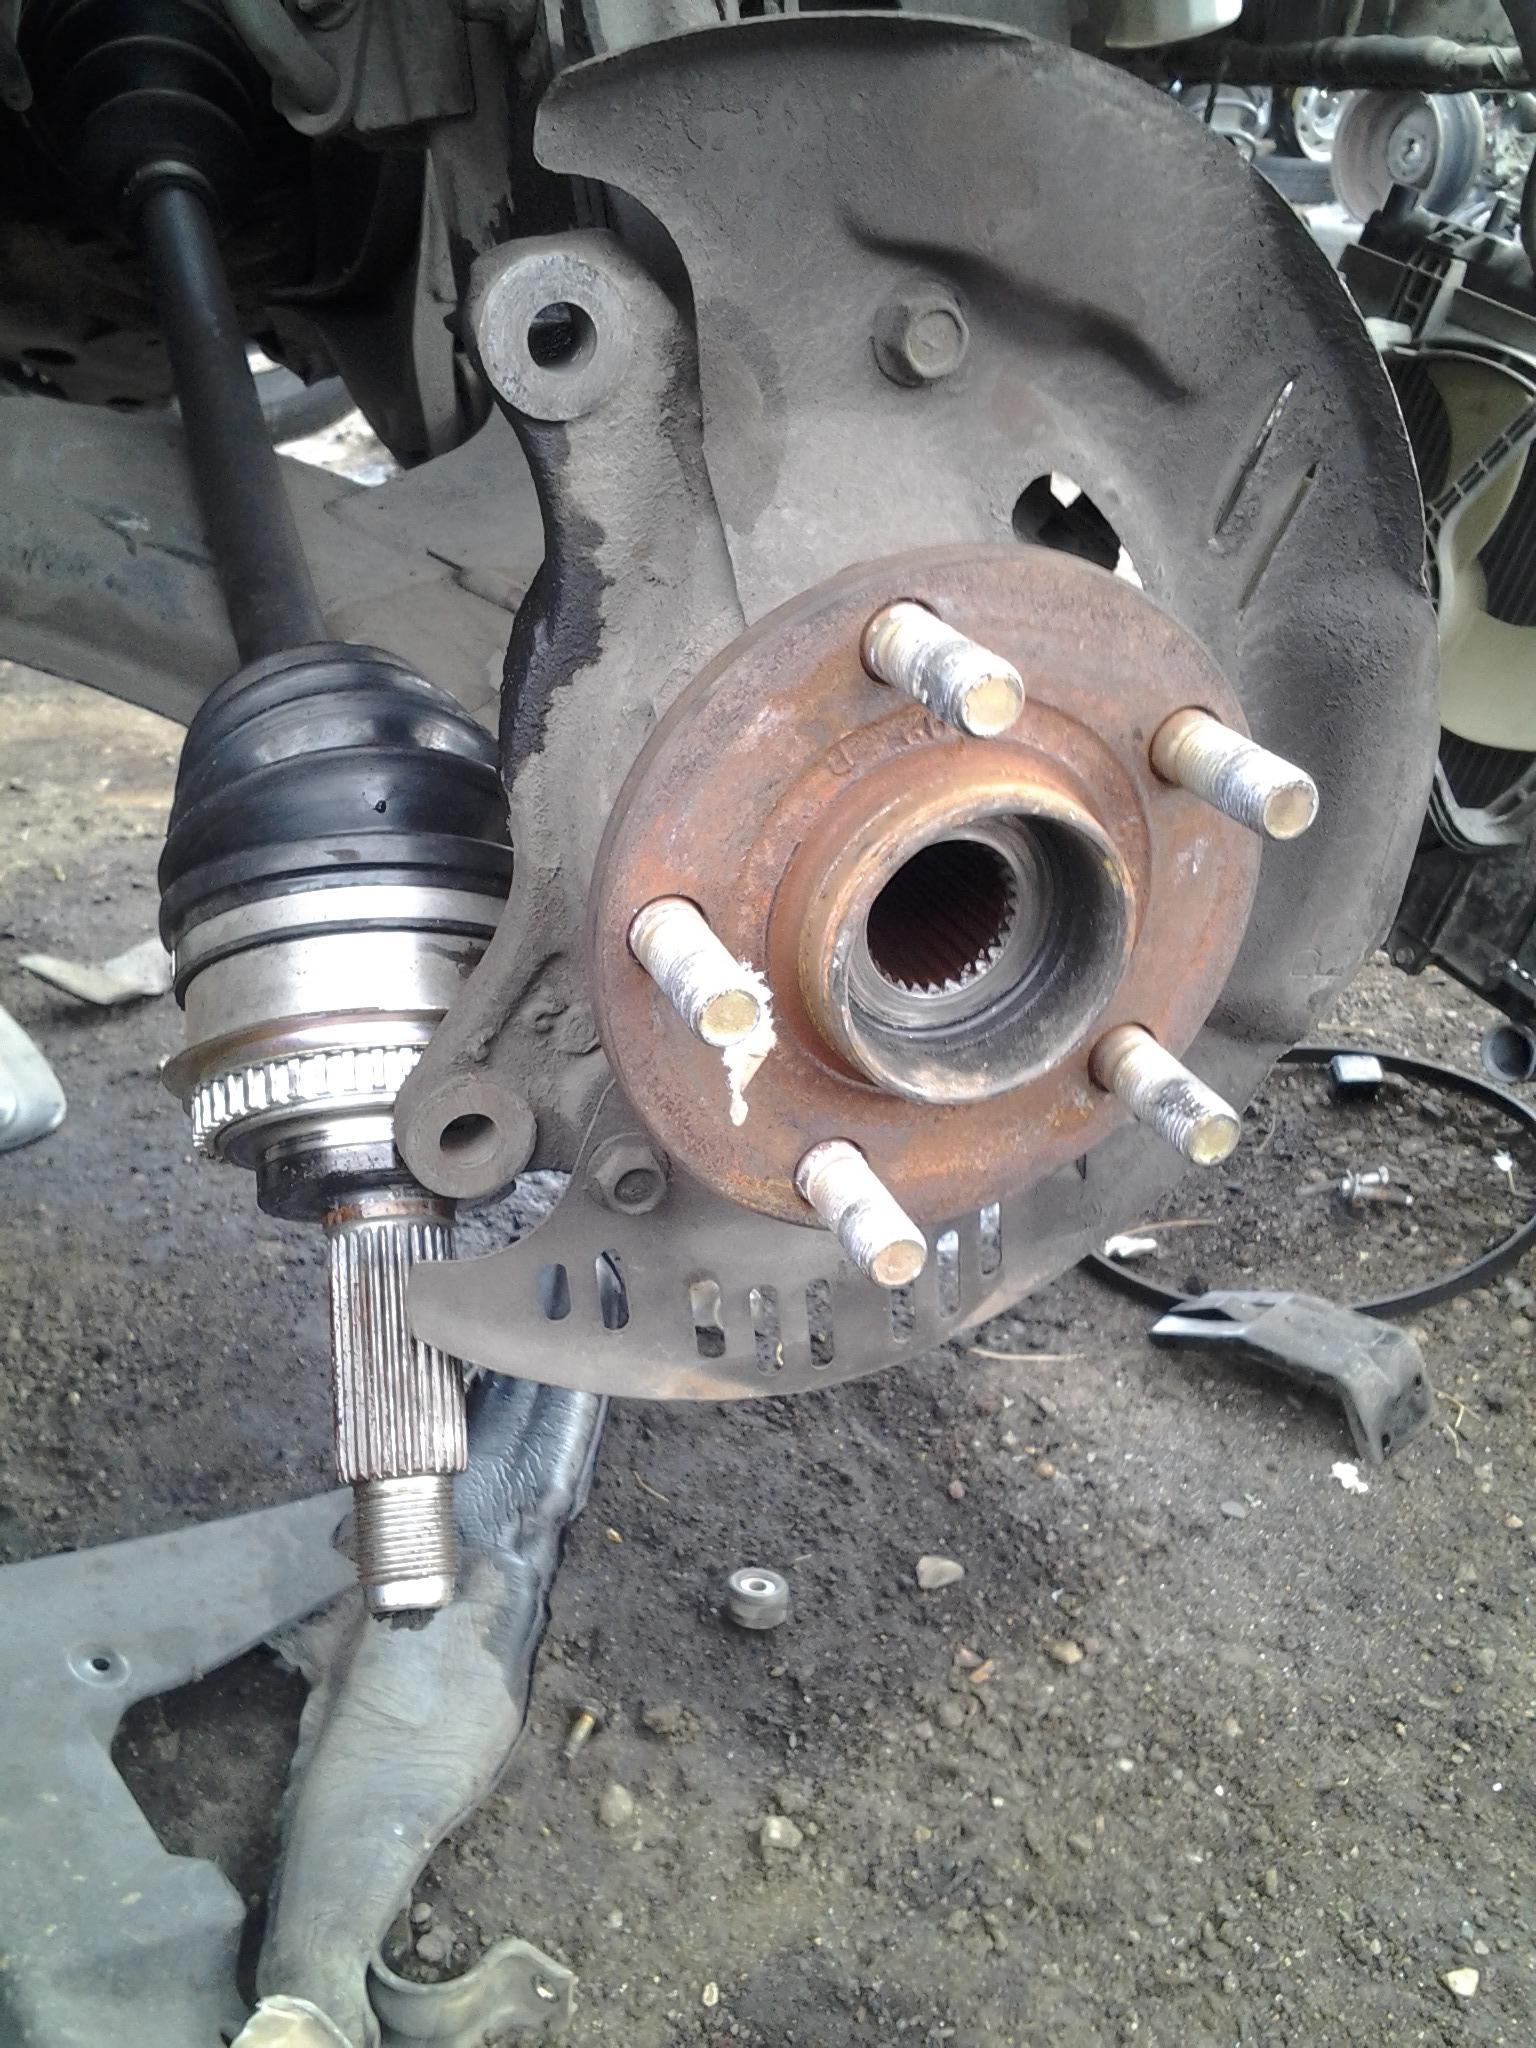 Subaru Salt Lake City >> How to remove wheel hub (2000 Outback) - Subaru Outback ...